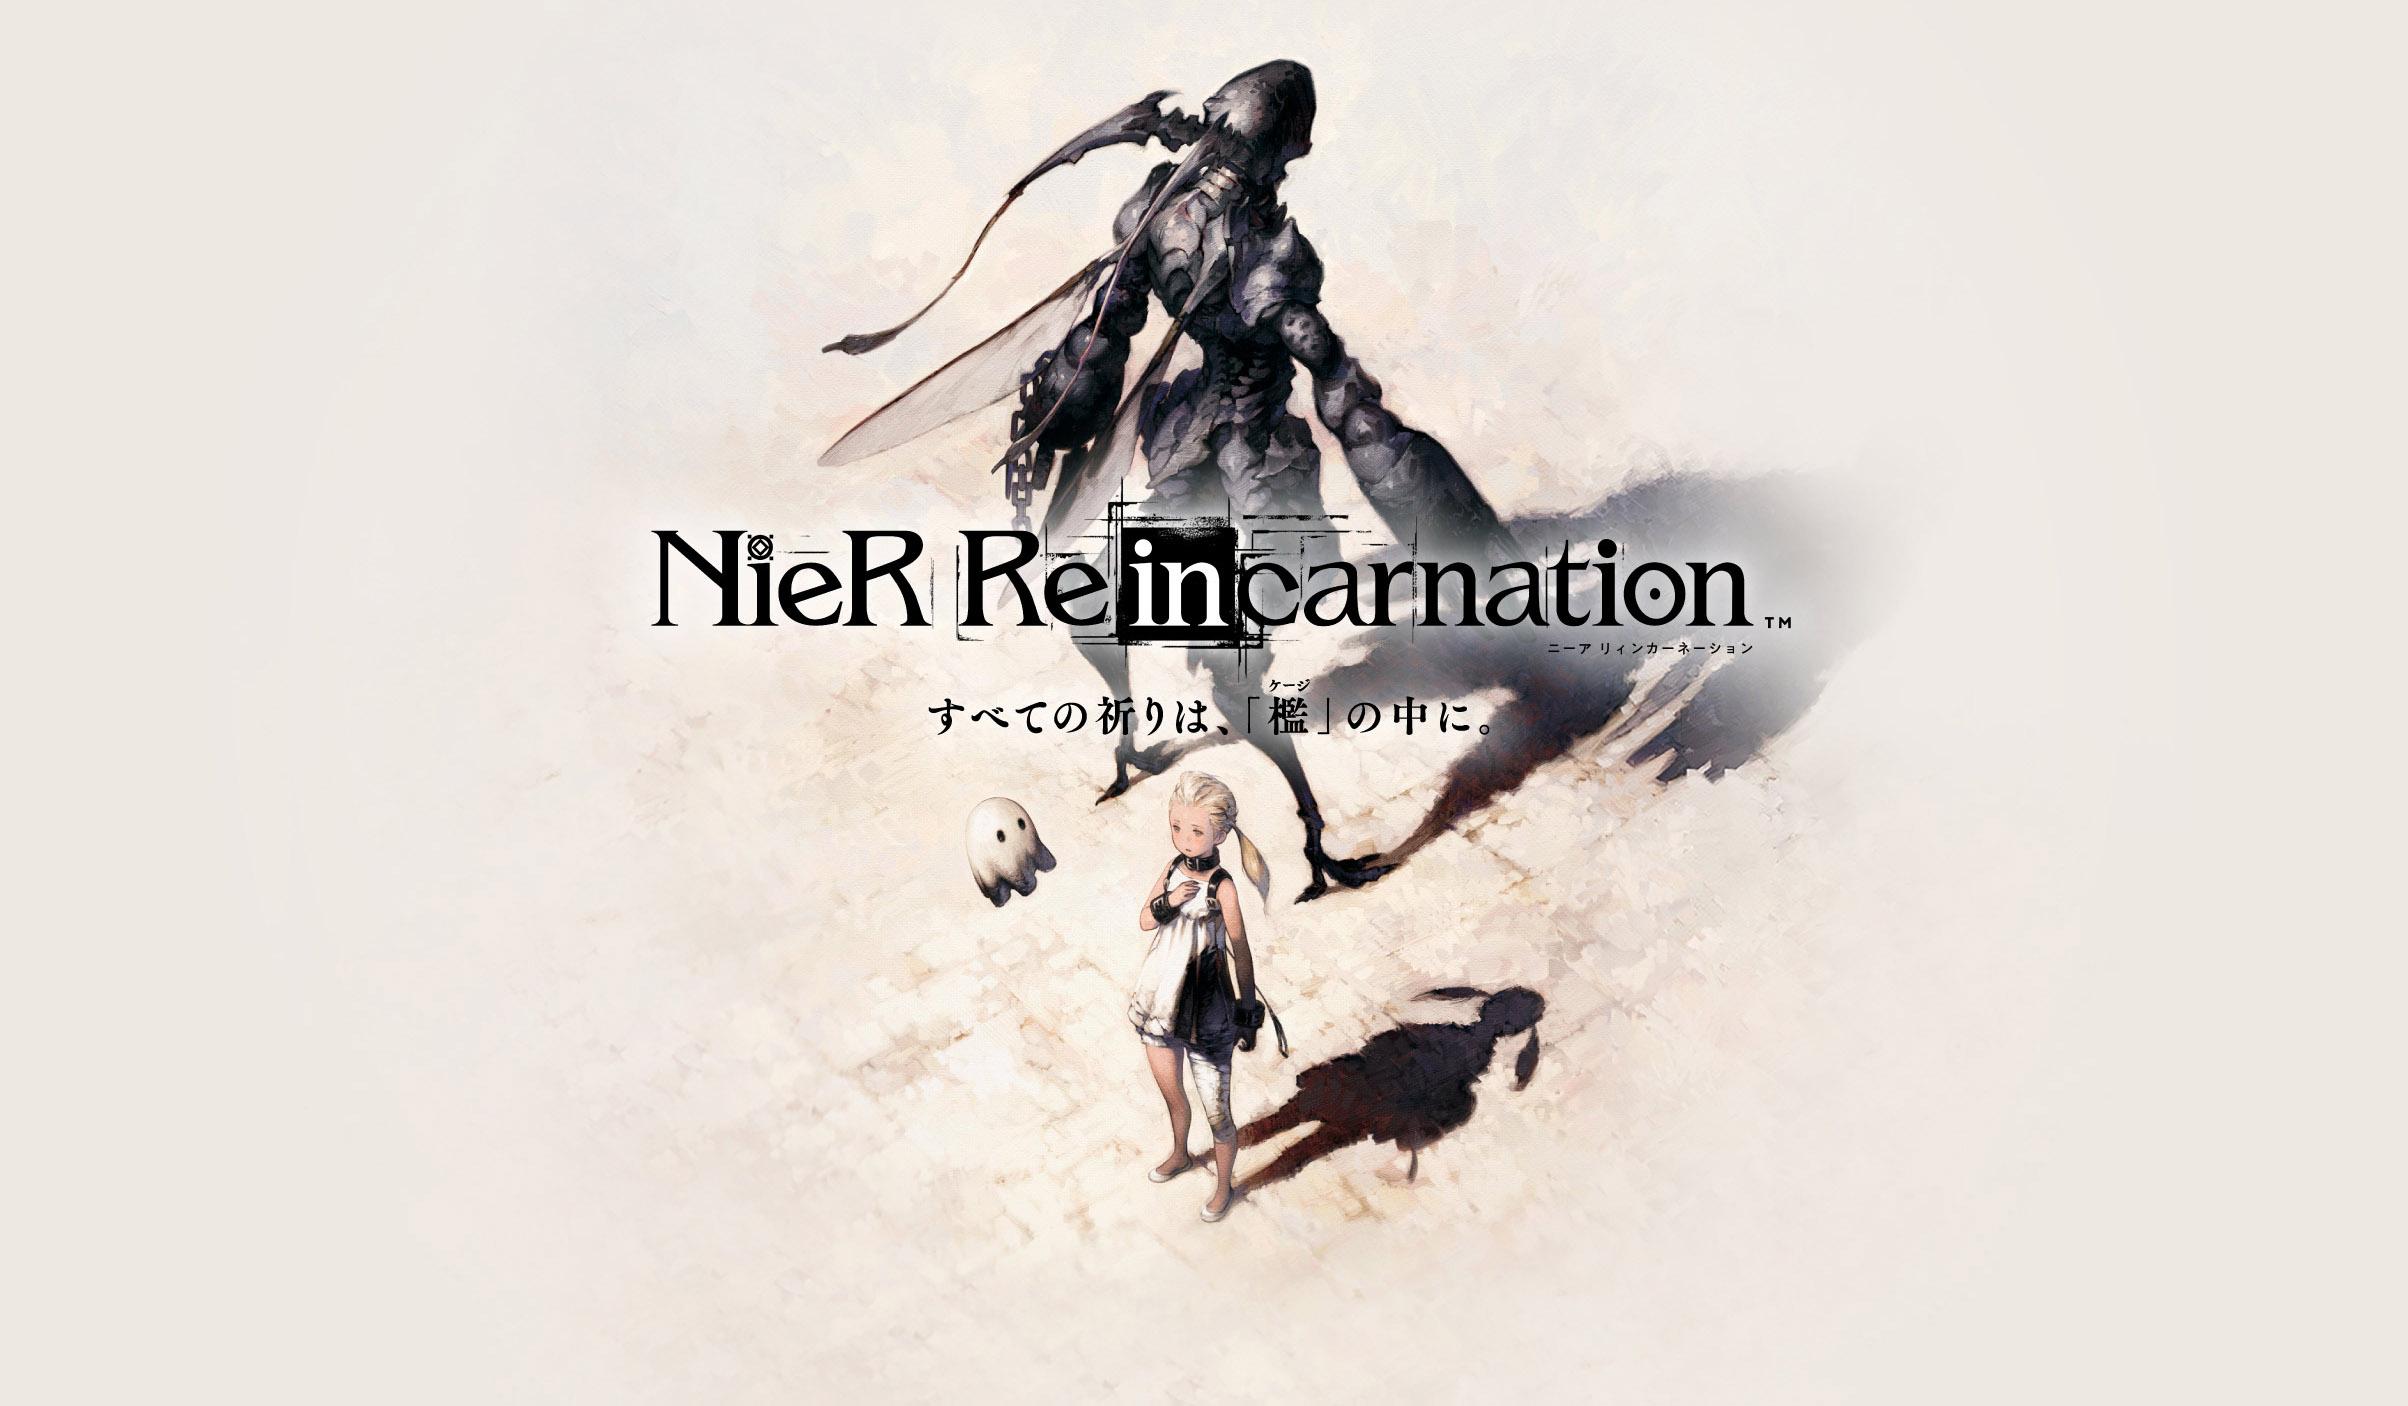 《尼尔:Re[in]carnation》新章节PV公布 4月14日上线